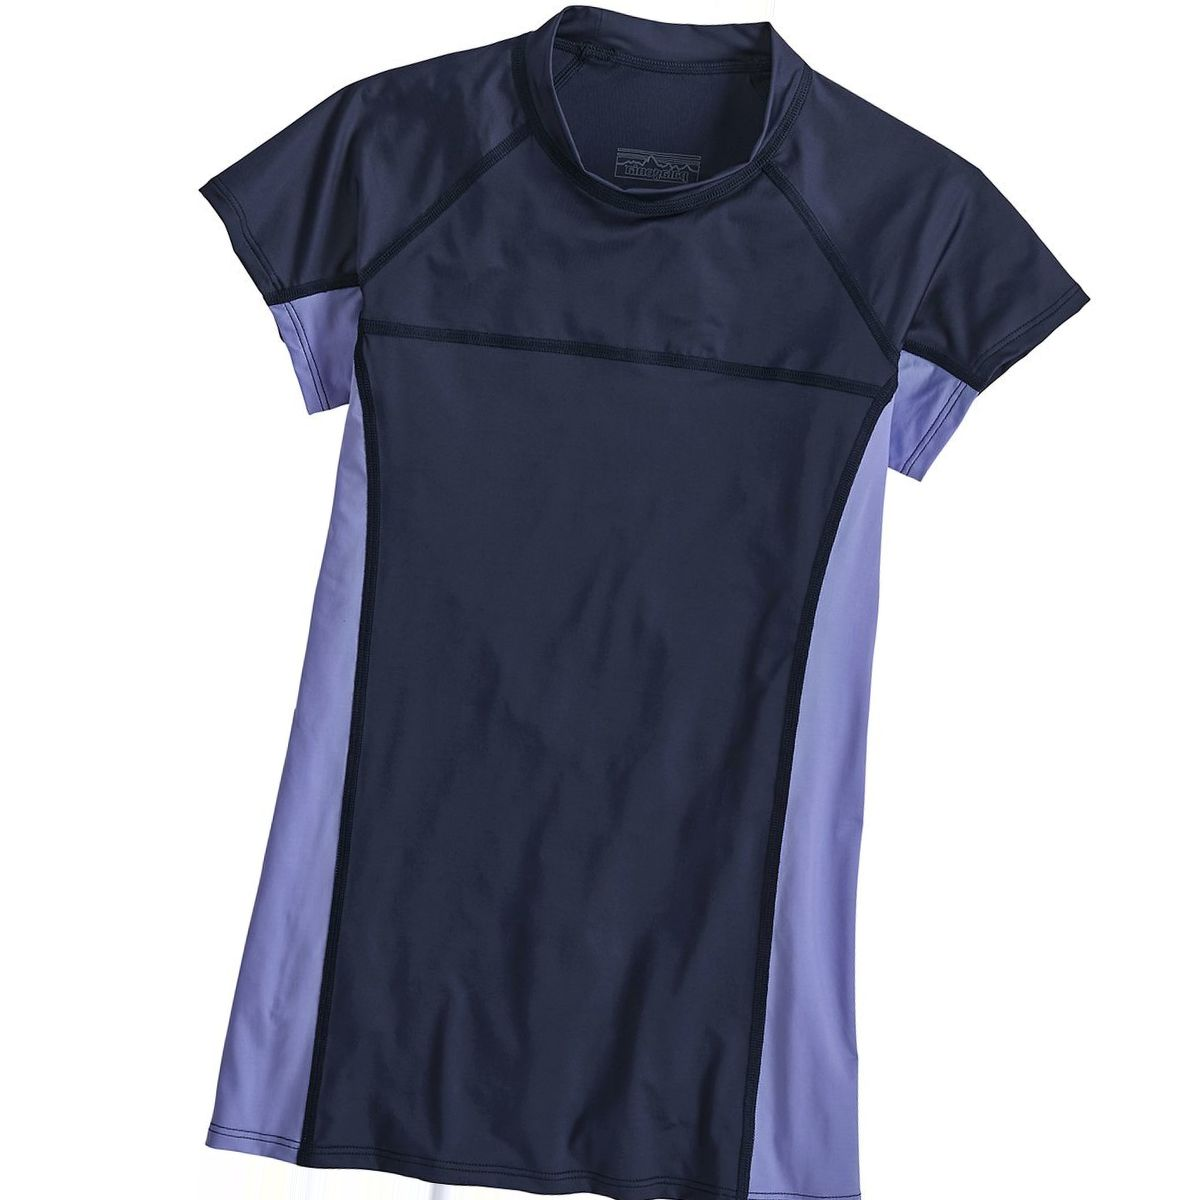 Patagonia Micro Swell Short-Sleeve Rashguard - Women's